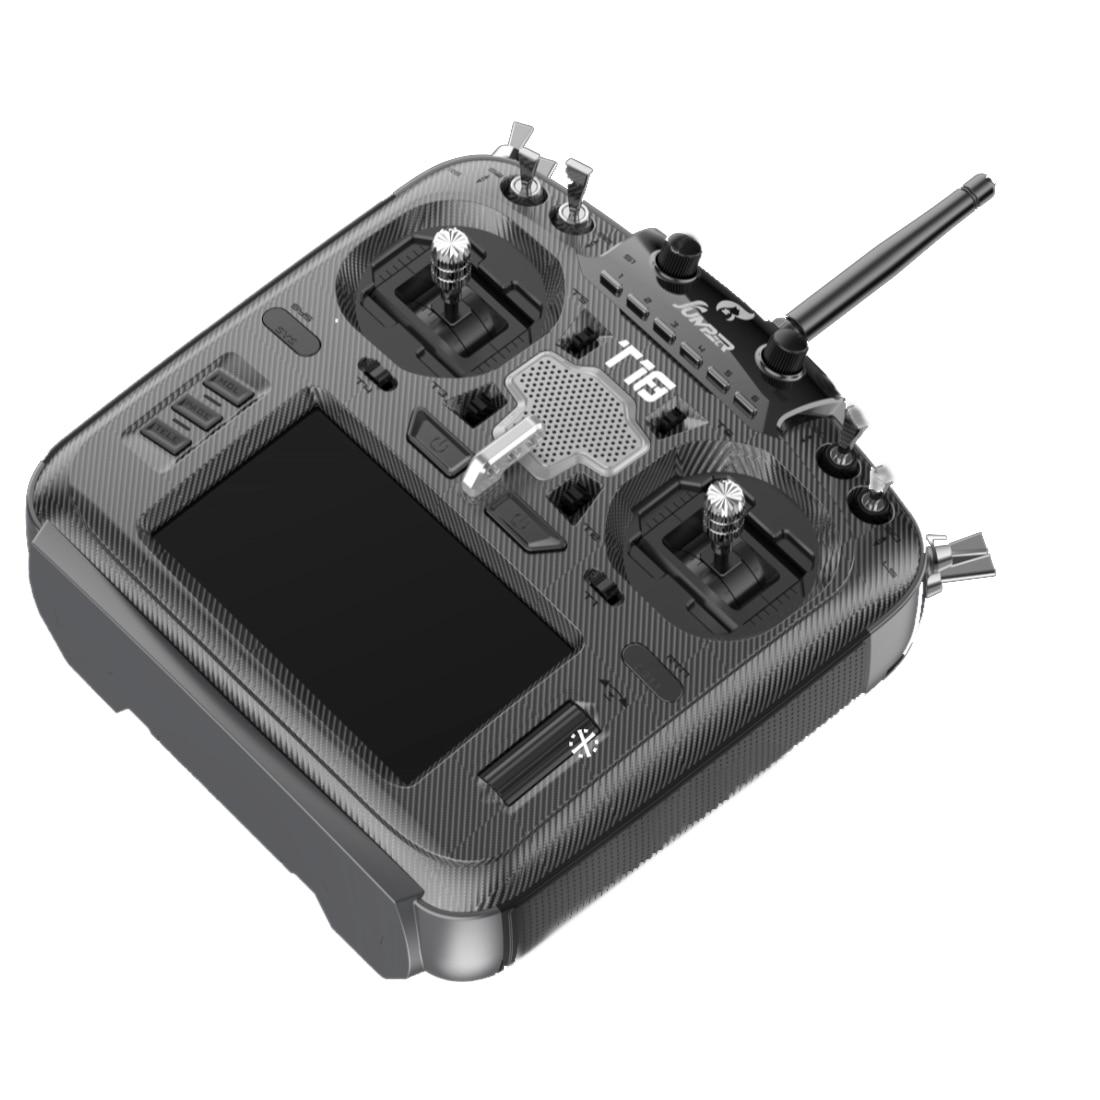 Jumper T18 T16 Hall Gimbal встроенный модуль с открытым исходным кодом мультипротокол радиопередатчик 2,4G 16CH 4,3 LCD JP5IN1 915mhz